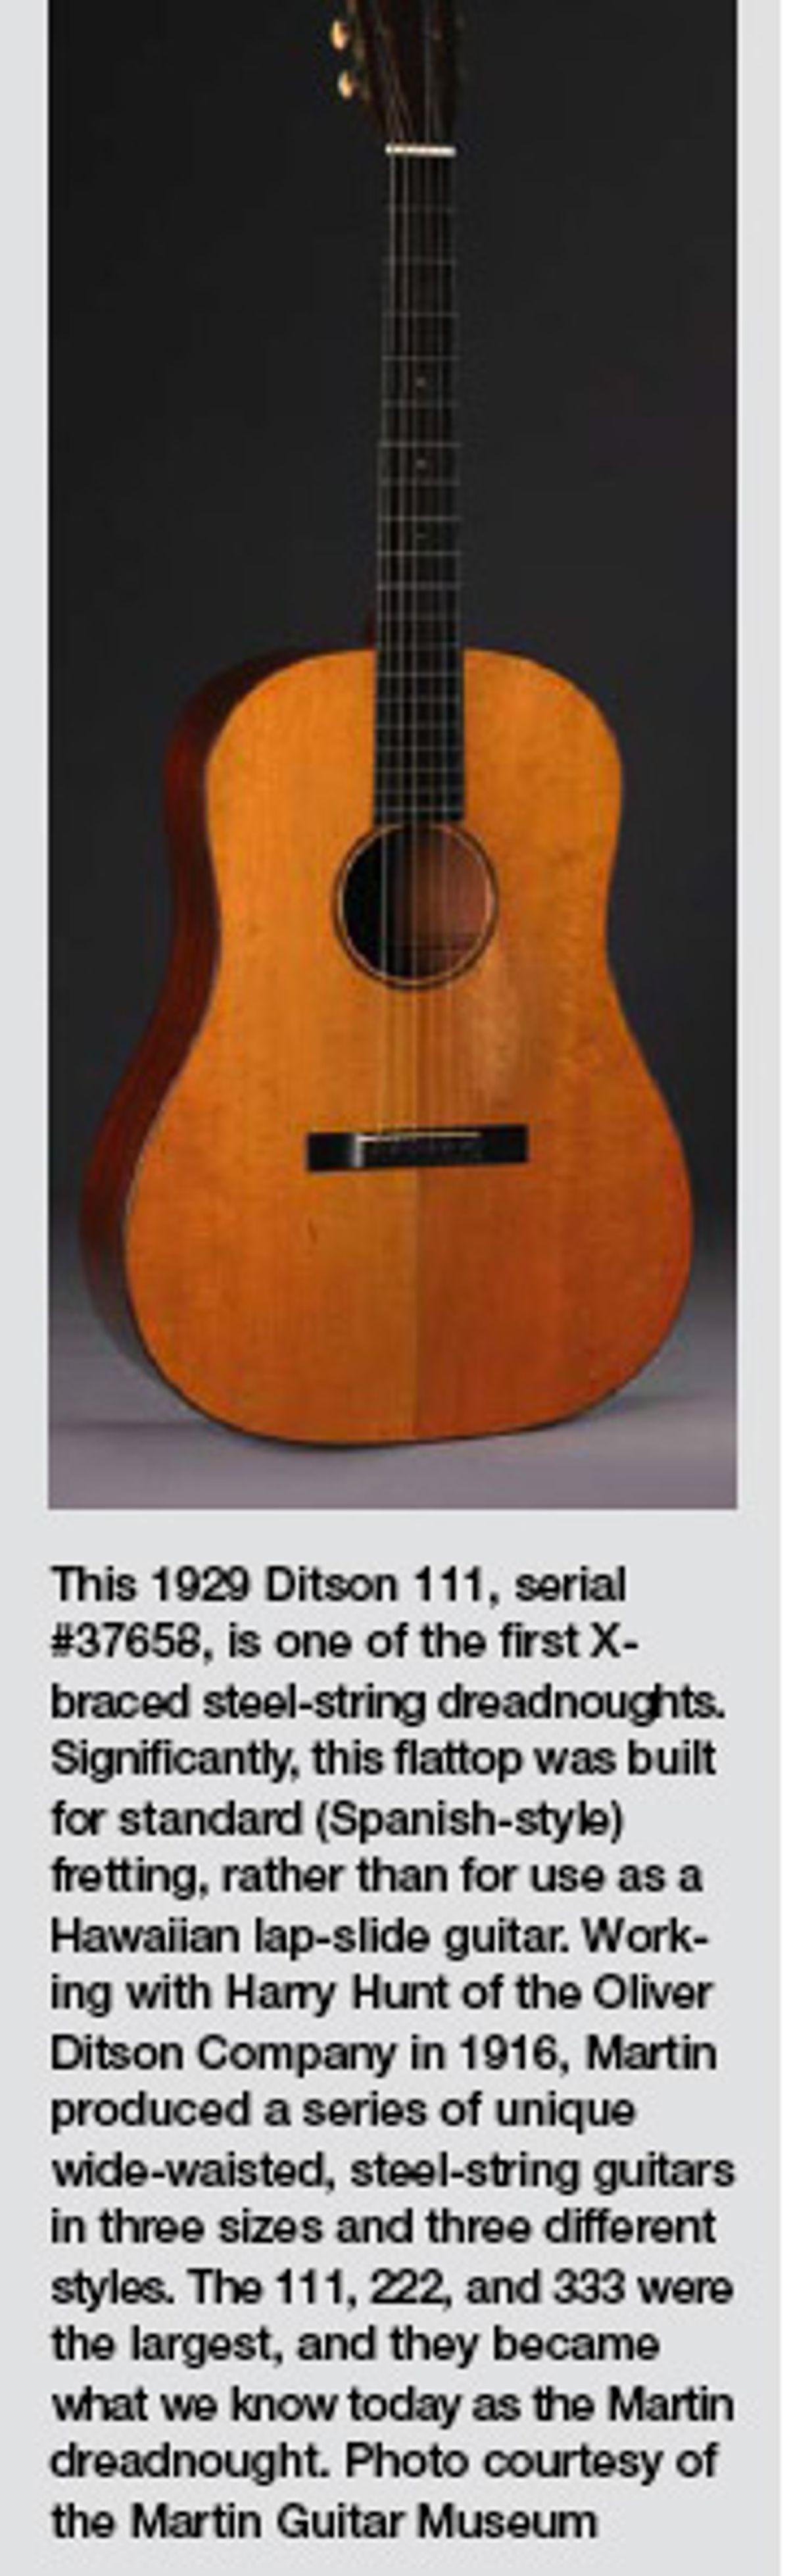 Tracking The Steel-String Guitar's Evolution, Pt. 1